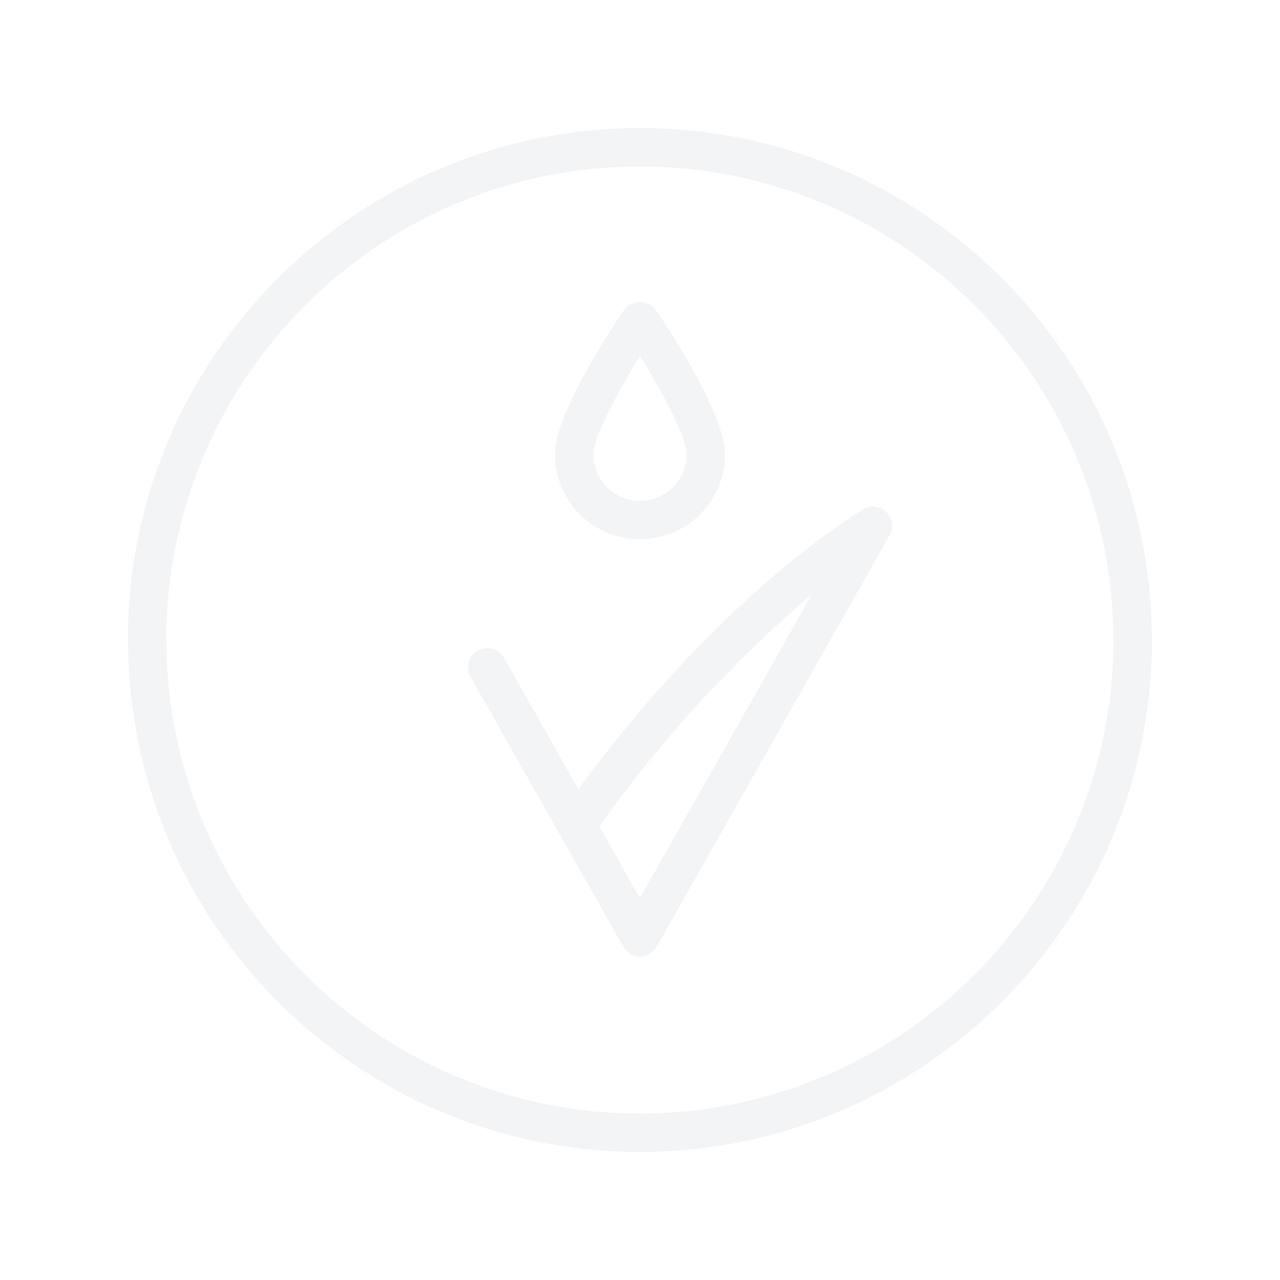 MISSHA Time Revolution Vitality Eye антивозрастной увлажняющий крем 25ml